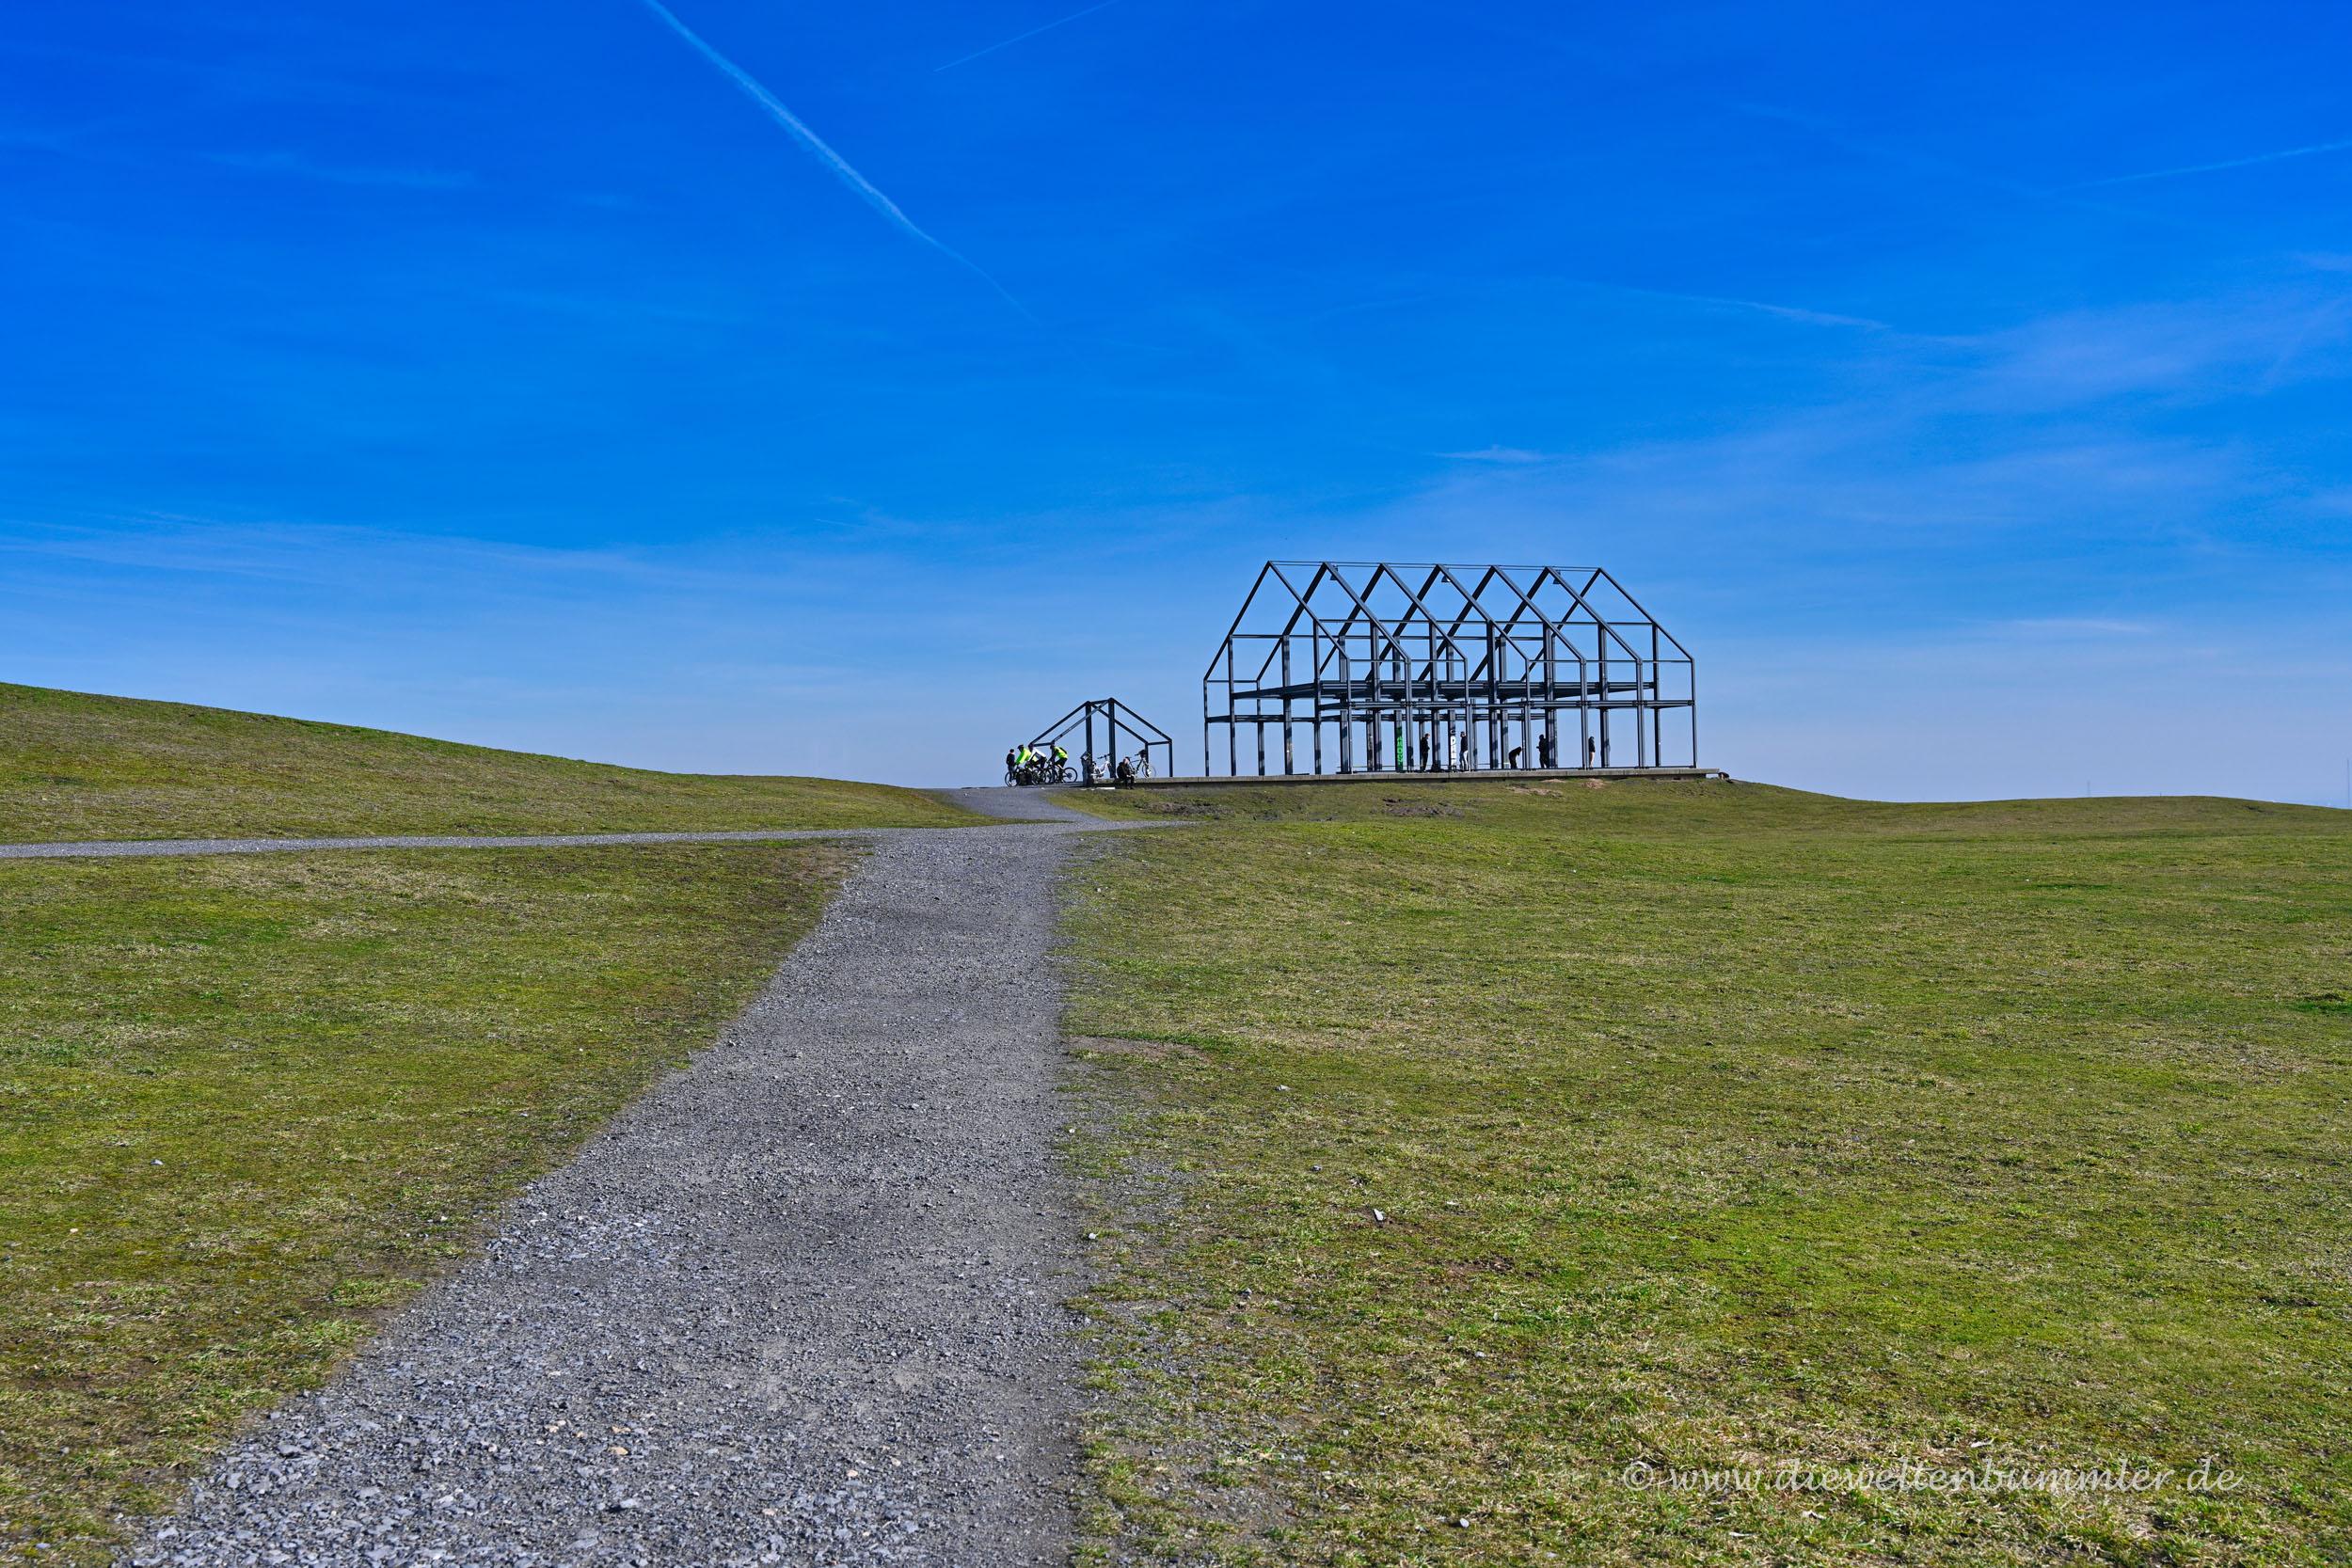 Landmarke Hallenhaus